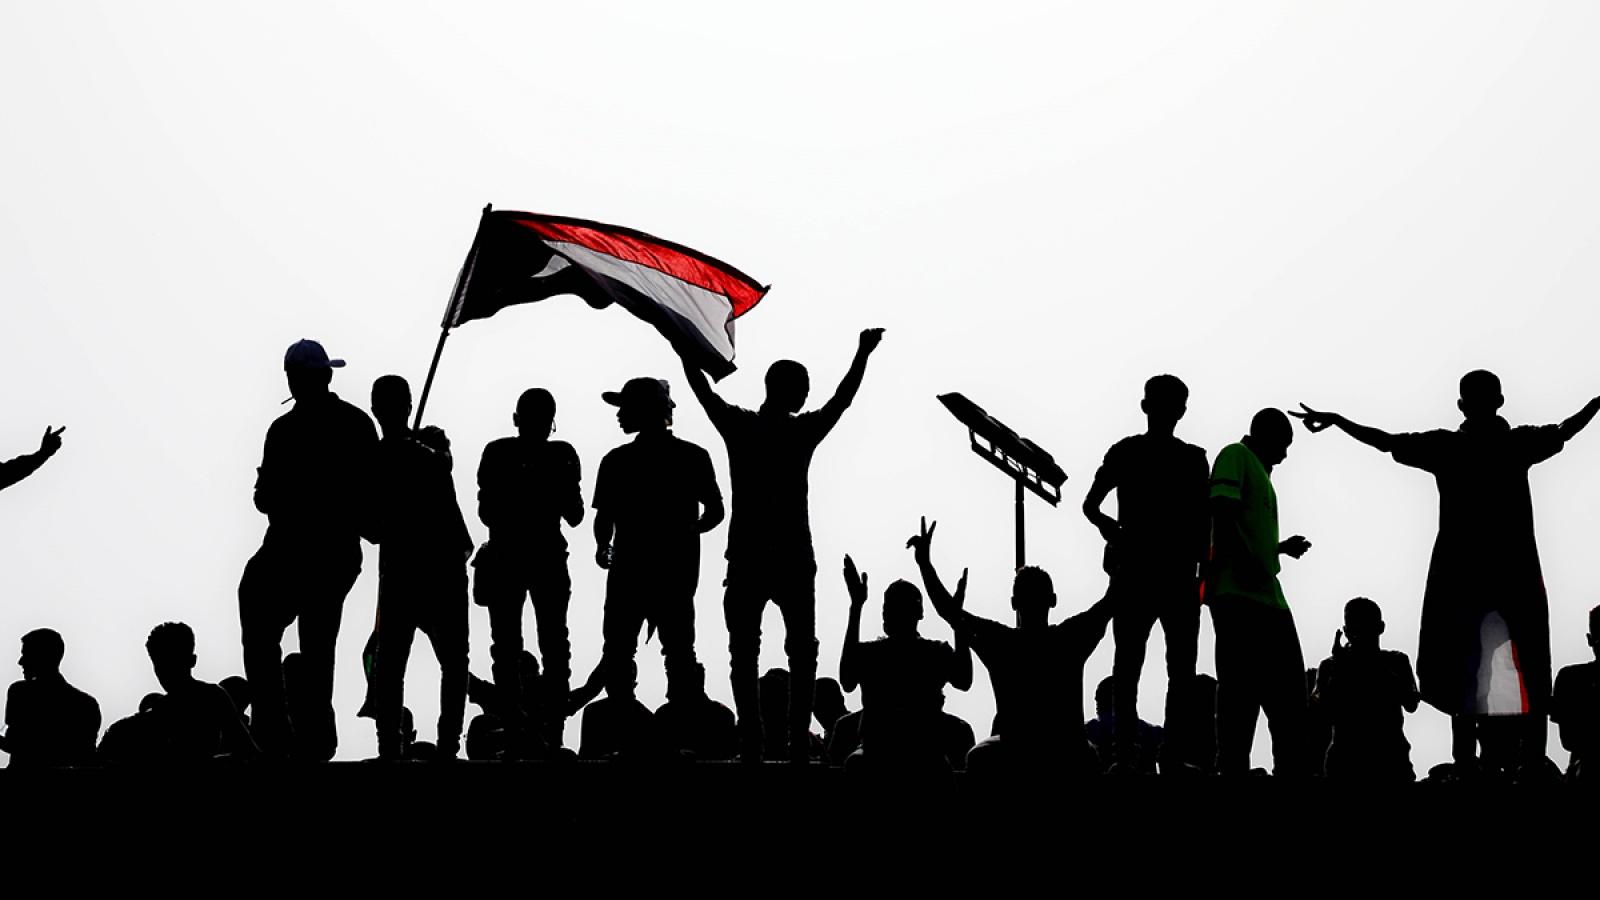 Sudan-Protest-Bashir-Transition.jpg